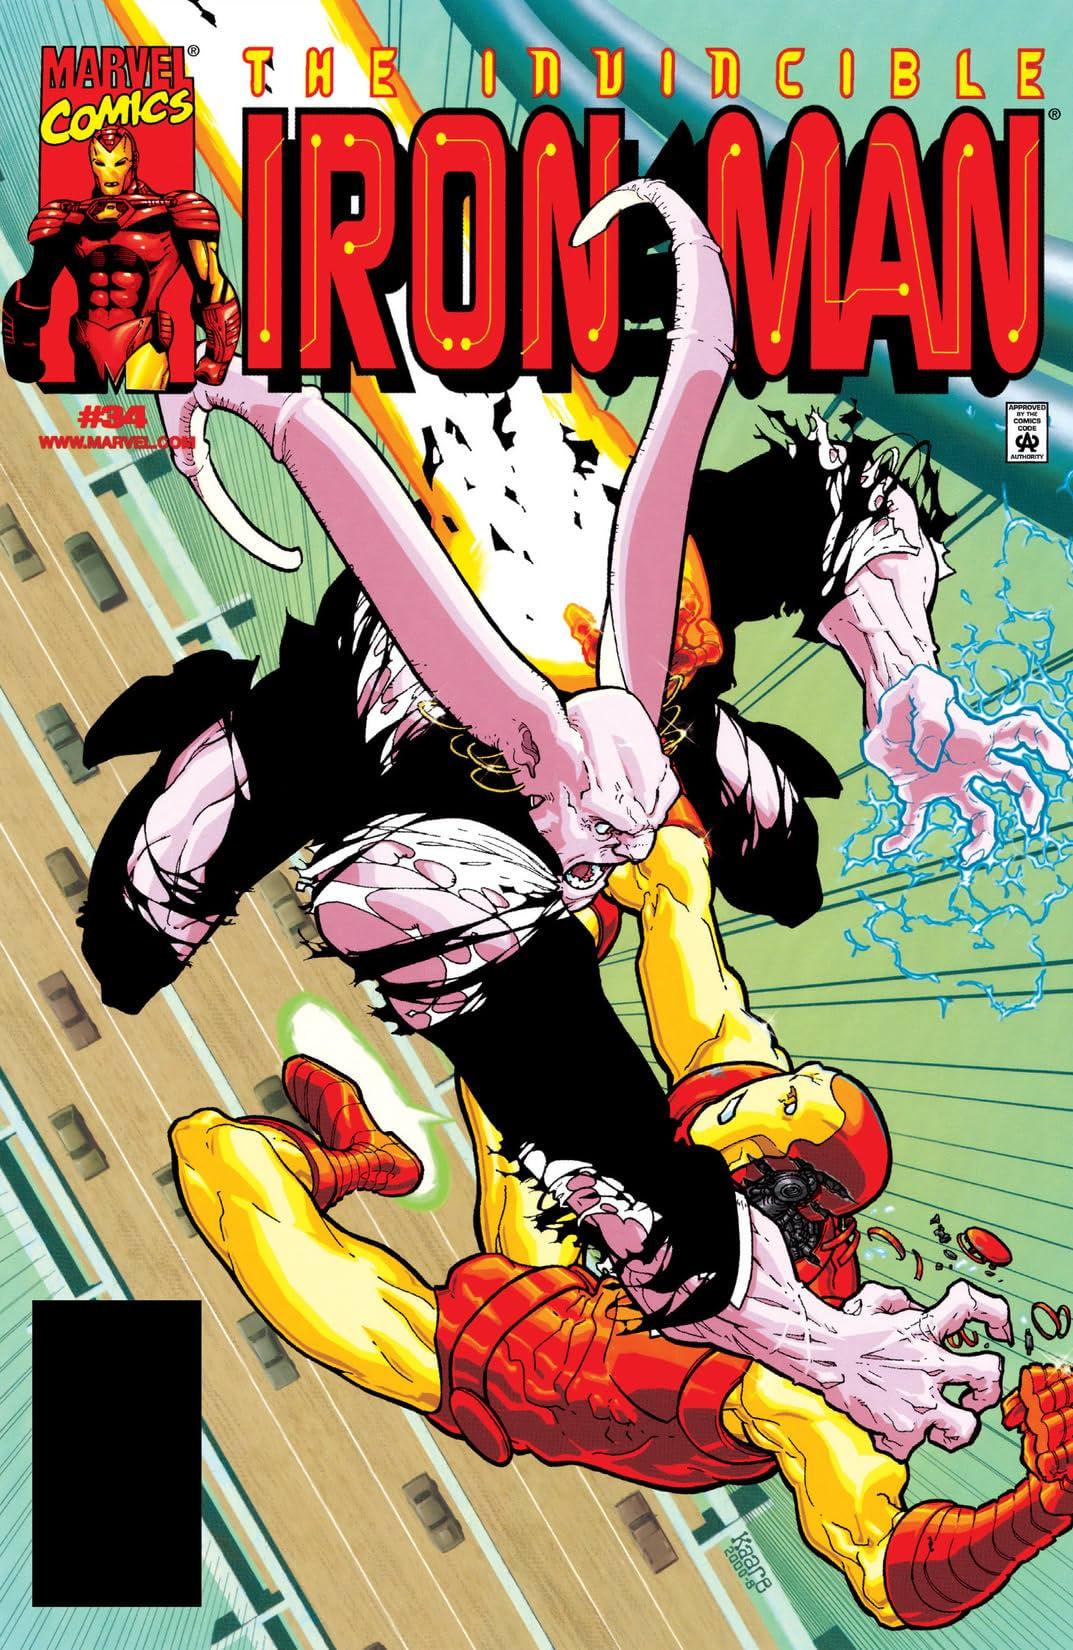 Iron Man (1998-2004) #34